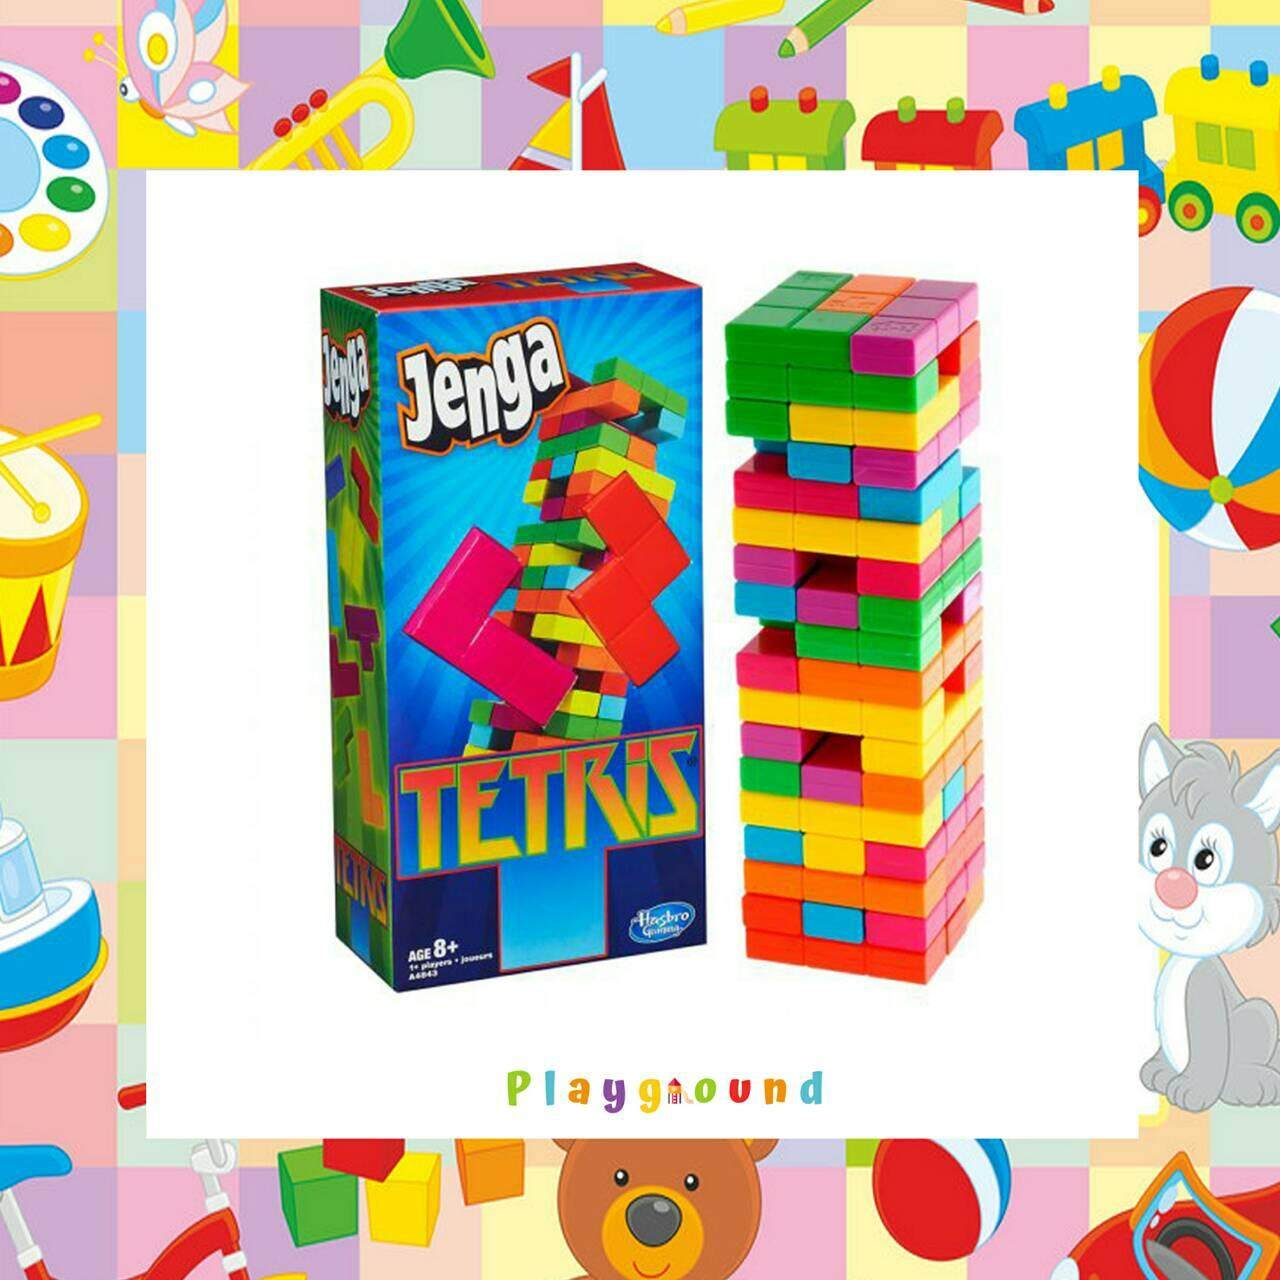 Jenga Tetris เกมส์ตึกถล่ม By Playground Th.